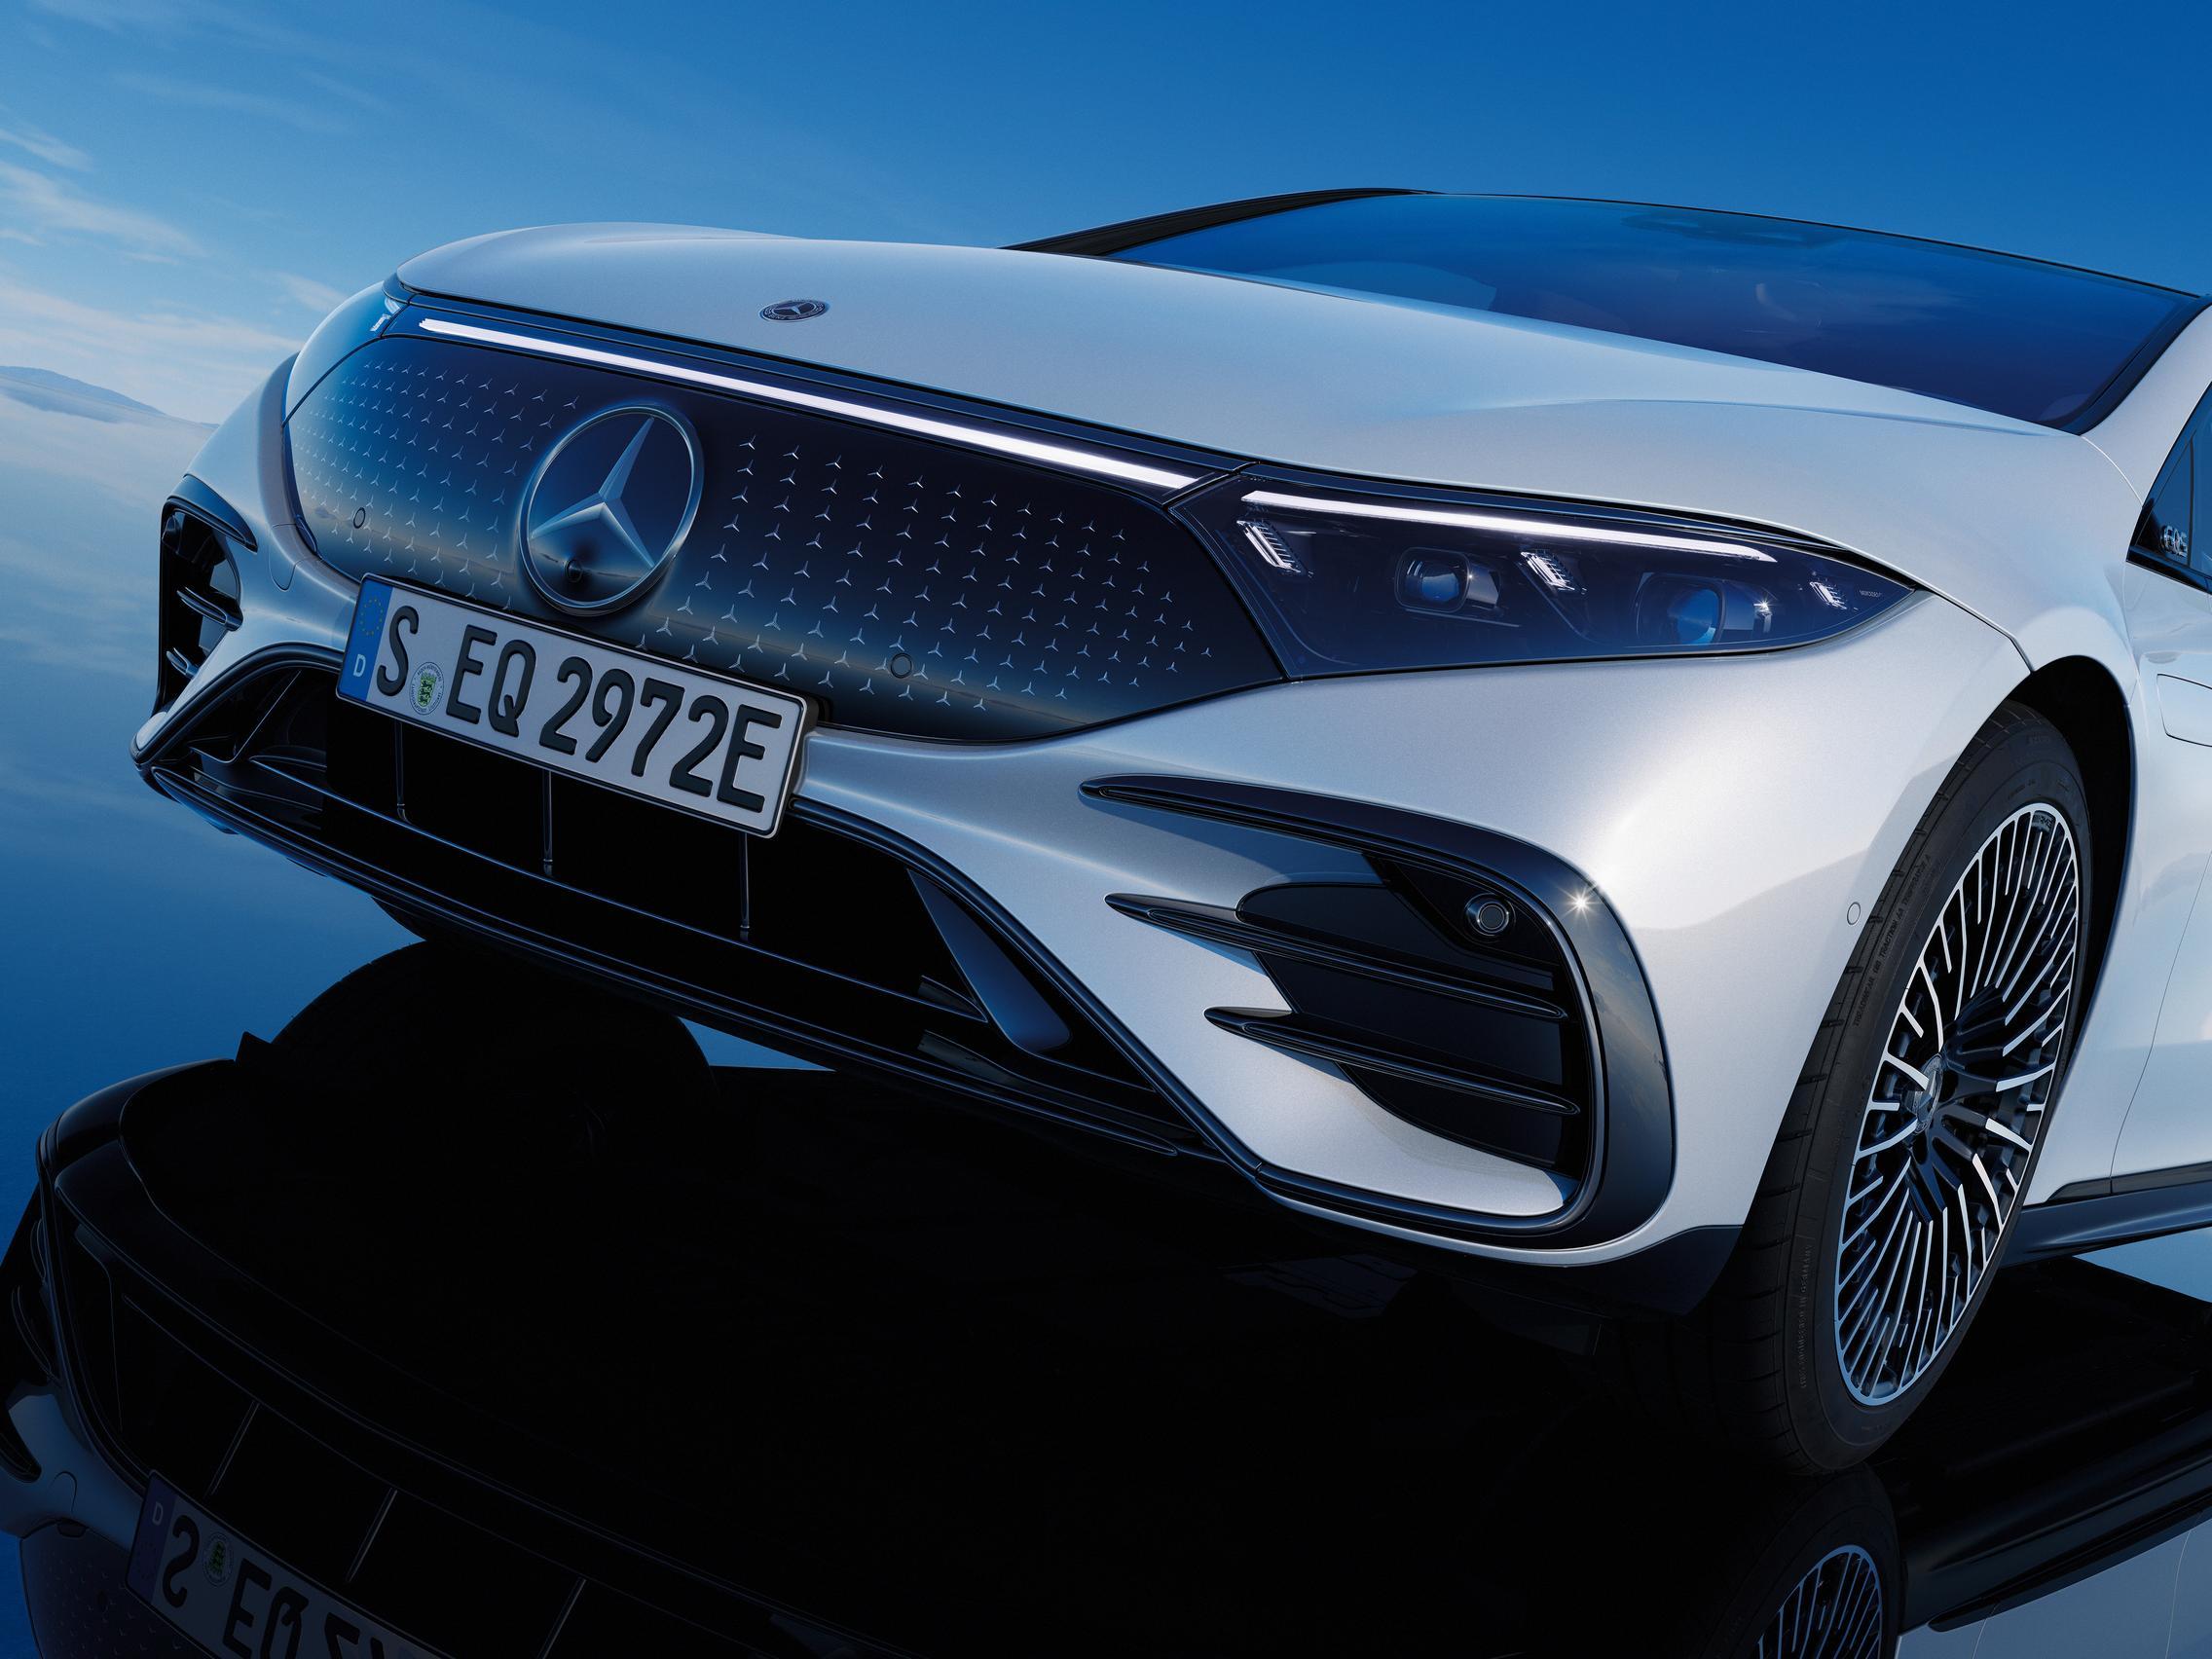 Mercedes EQS front grille